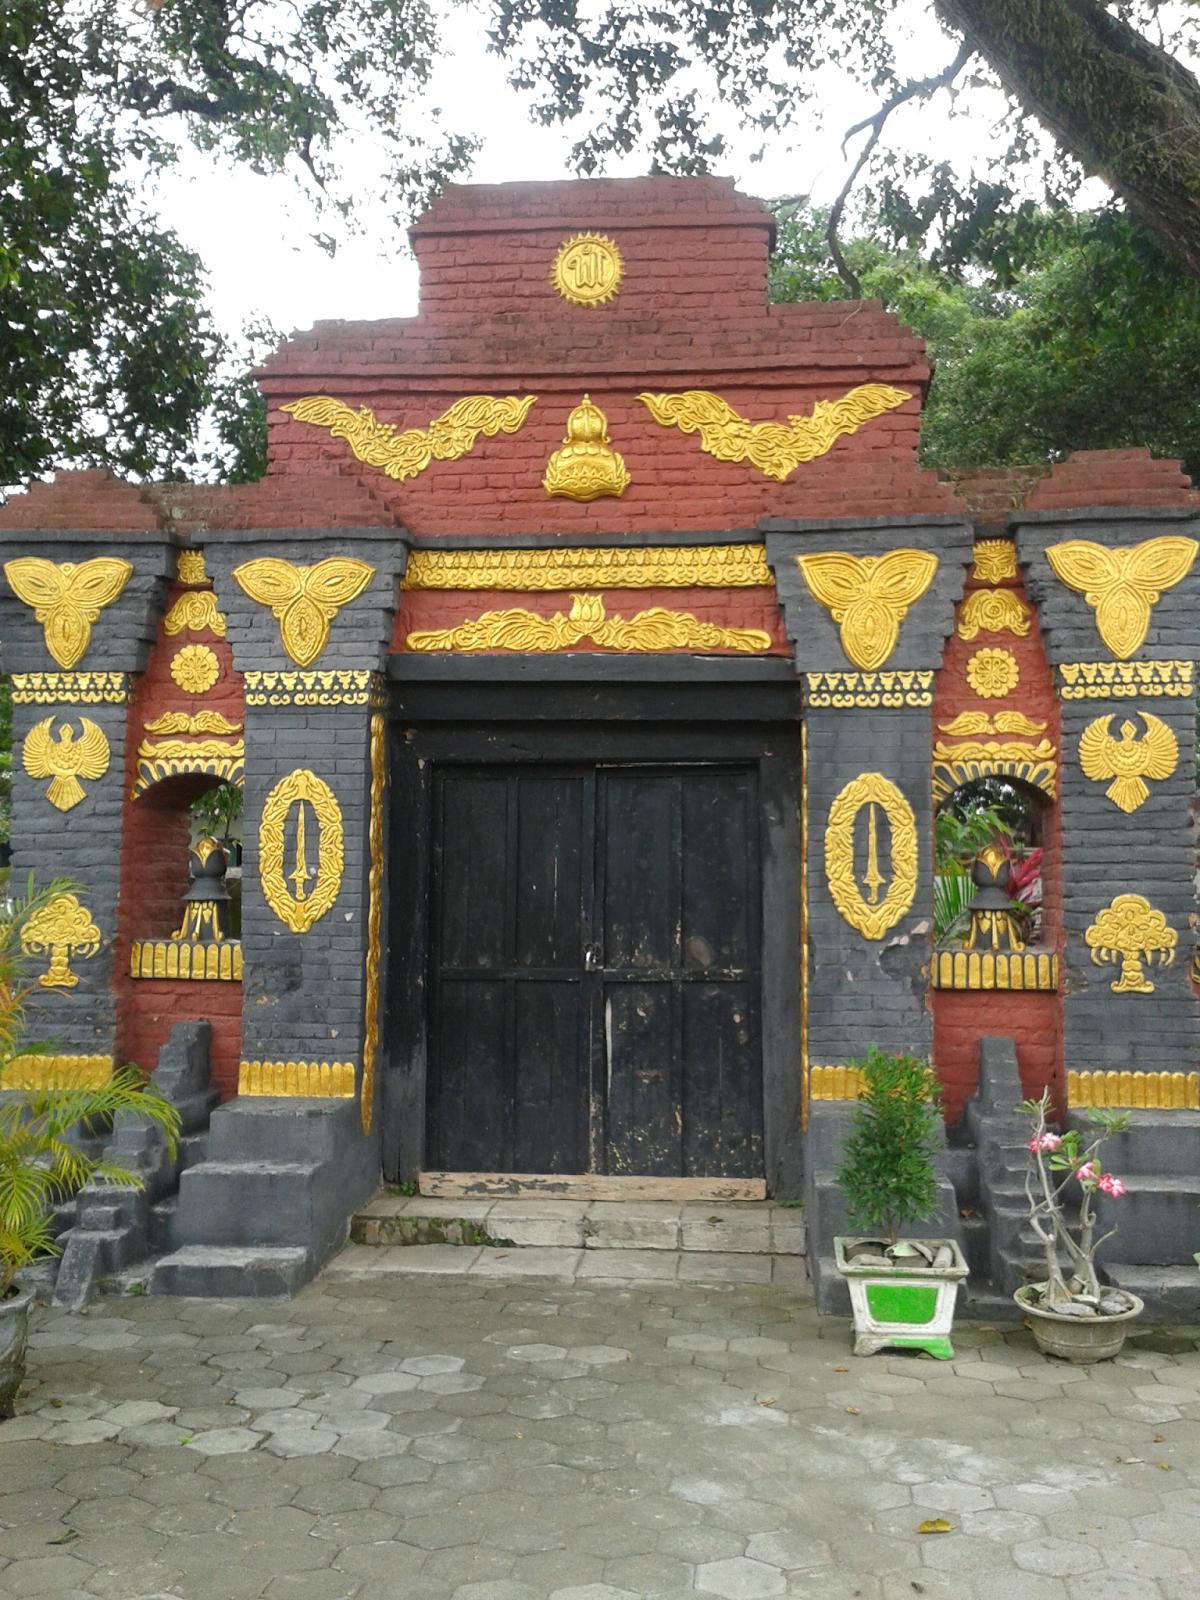 Mengunjungi Wisata Religi Masjid Makam Taman Madiun Lelaki Akrab Dipanggil